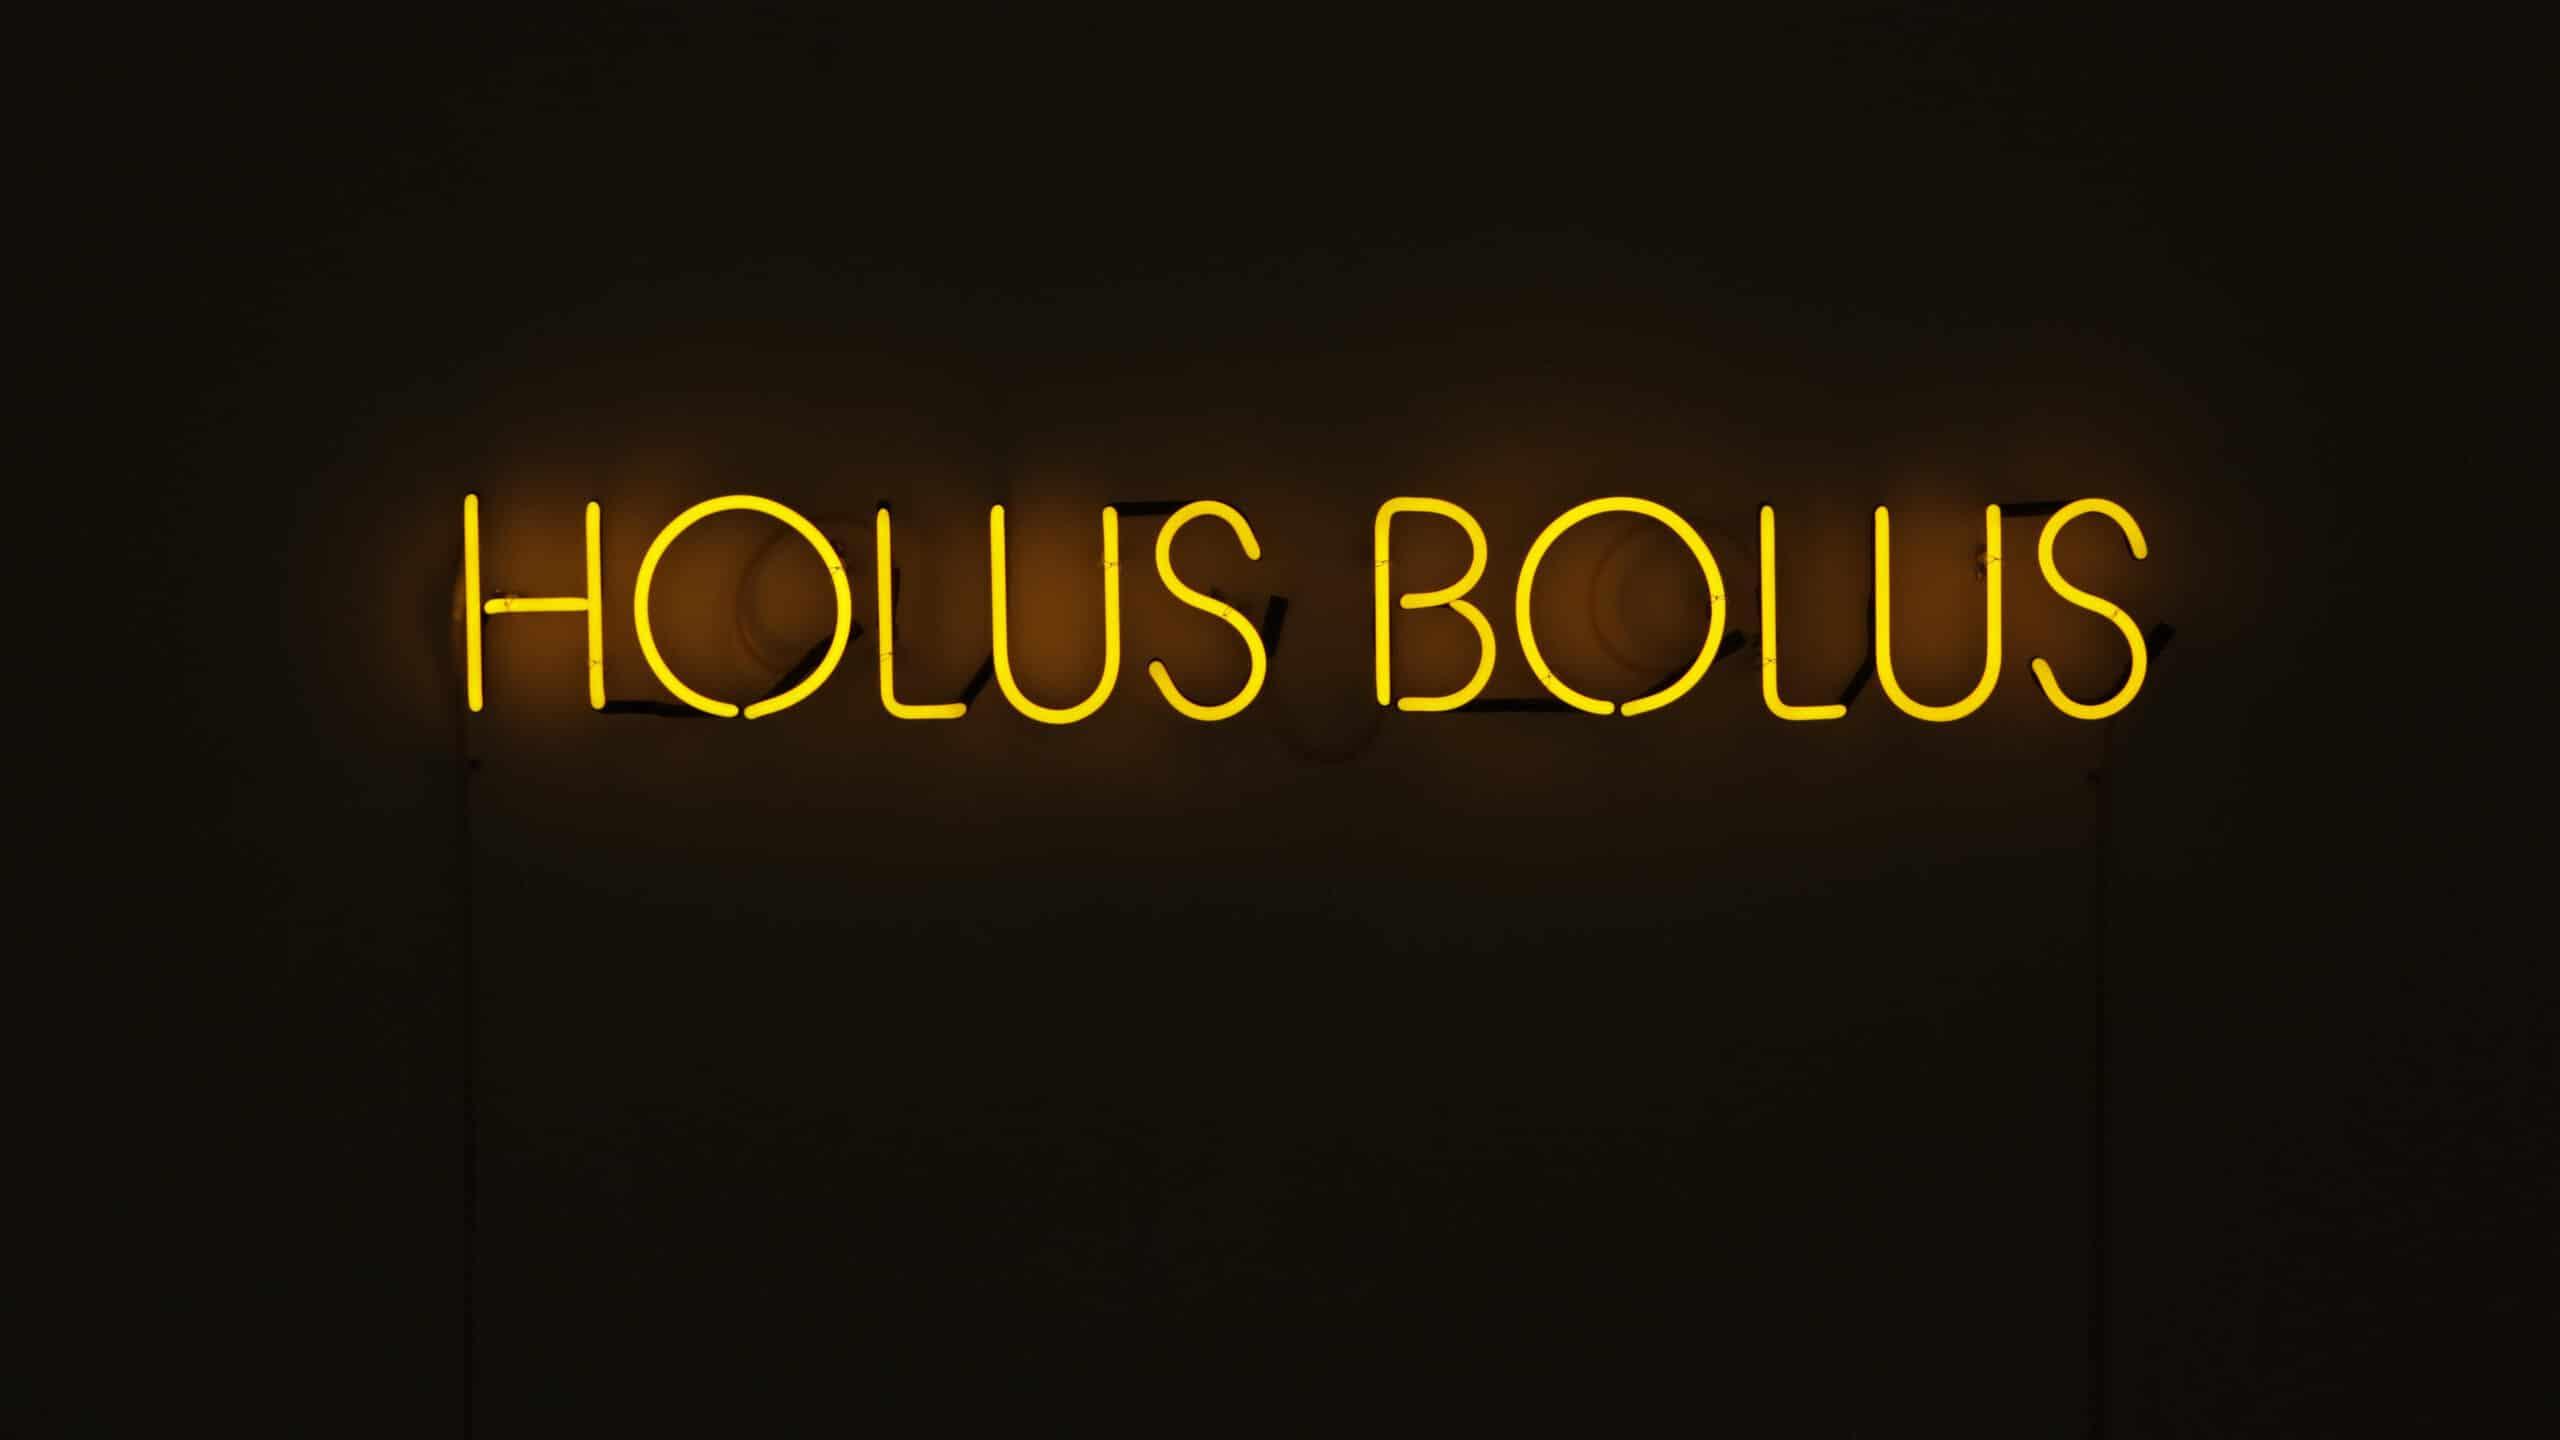 Tina Havelock Stevens, 'Holus Bolus', 2020, Gold Neon, 152cm x 20cm